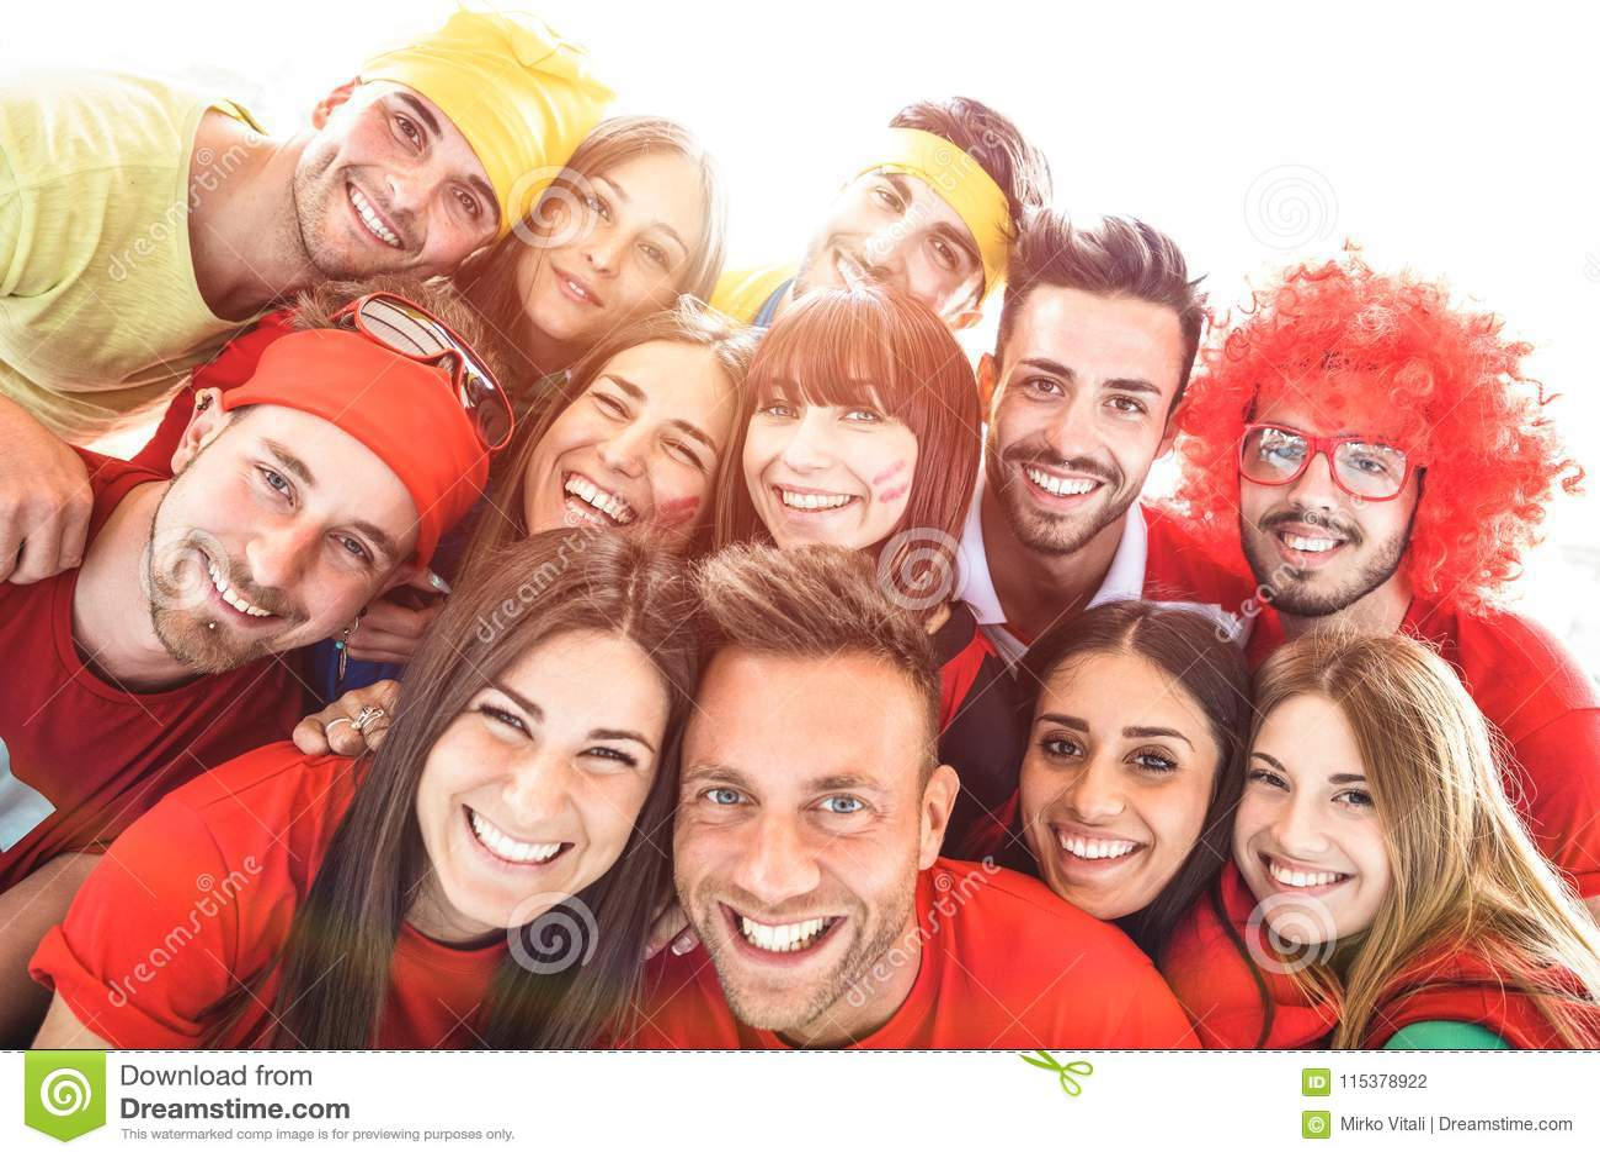 Happy sport friends taking selfie at world soccer event - Friend